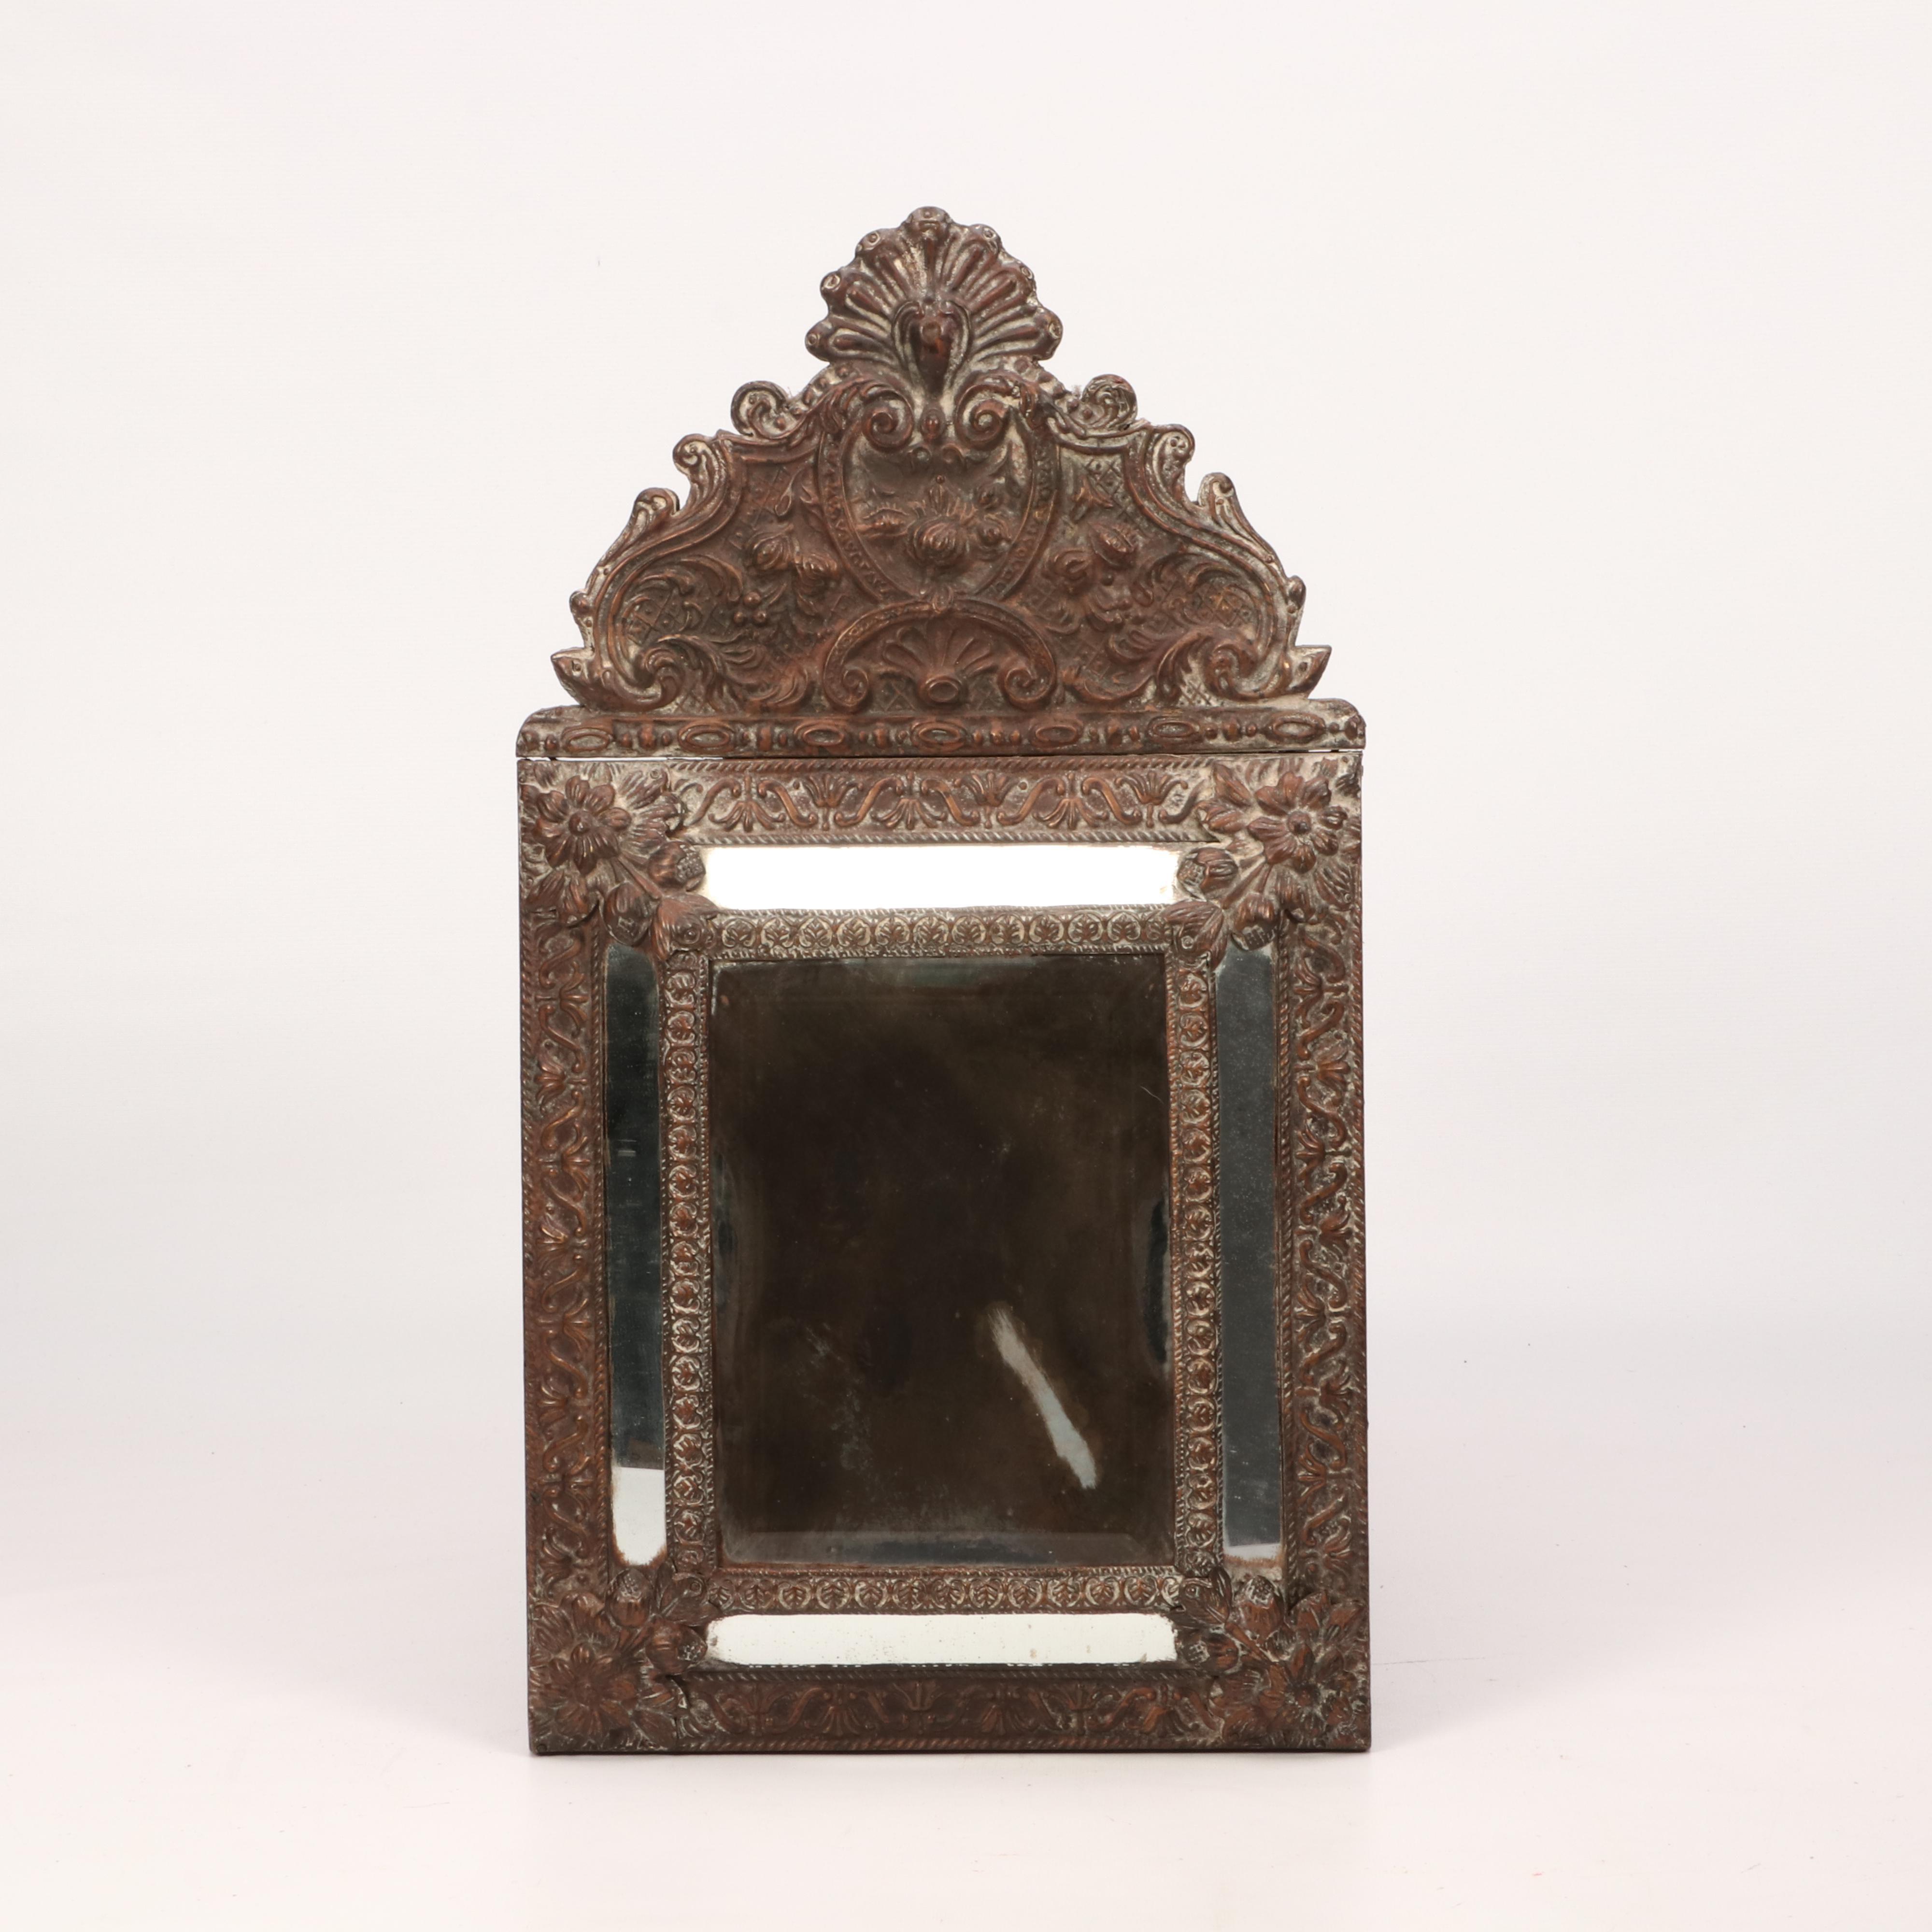 Repoussé Brass Mirror in Dutch Baroque Style